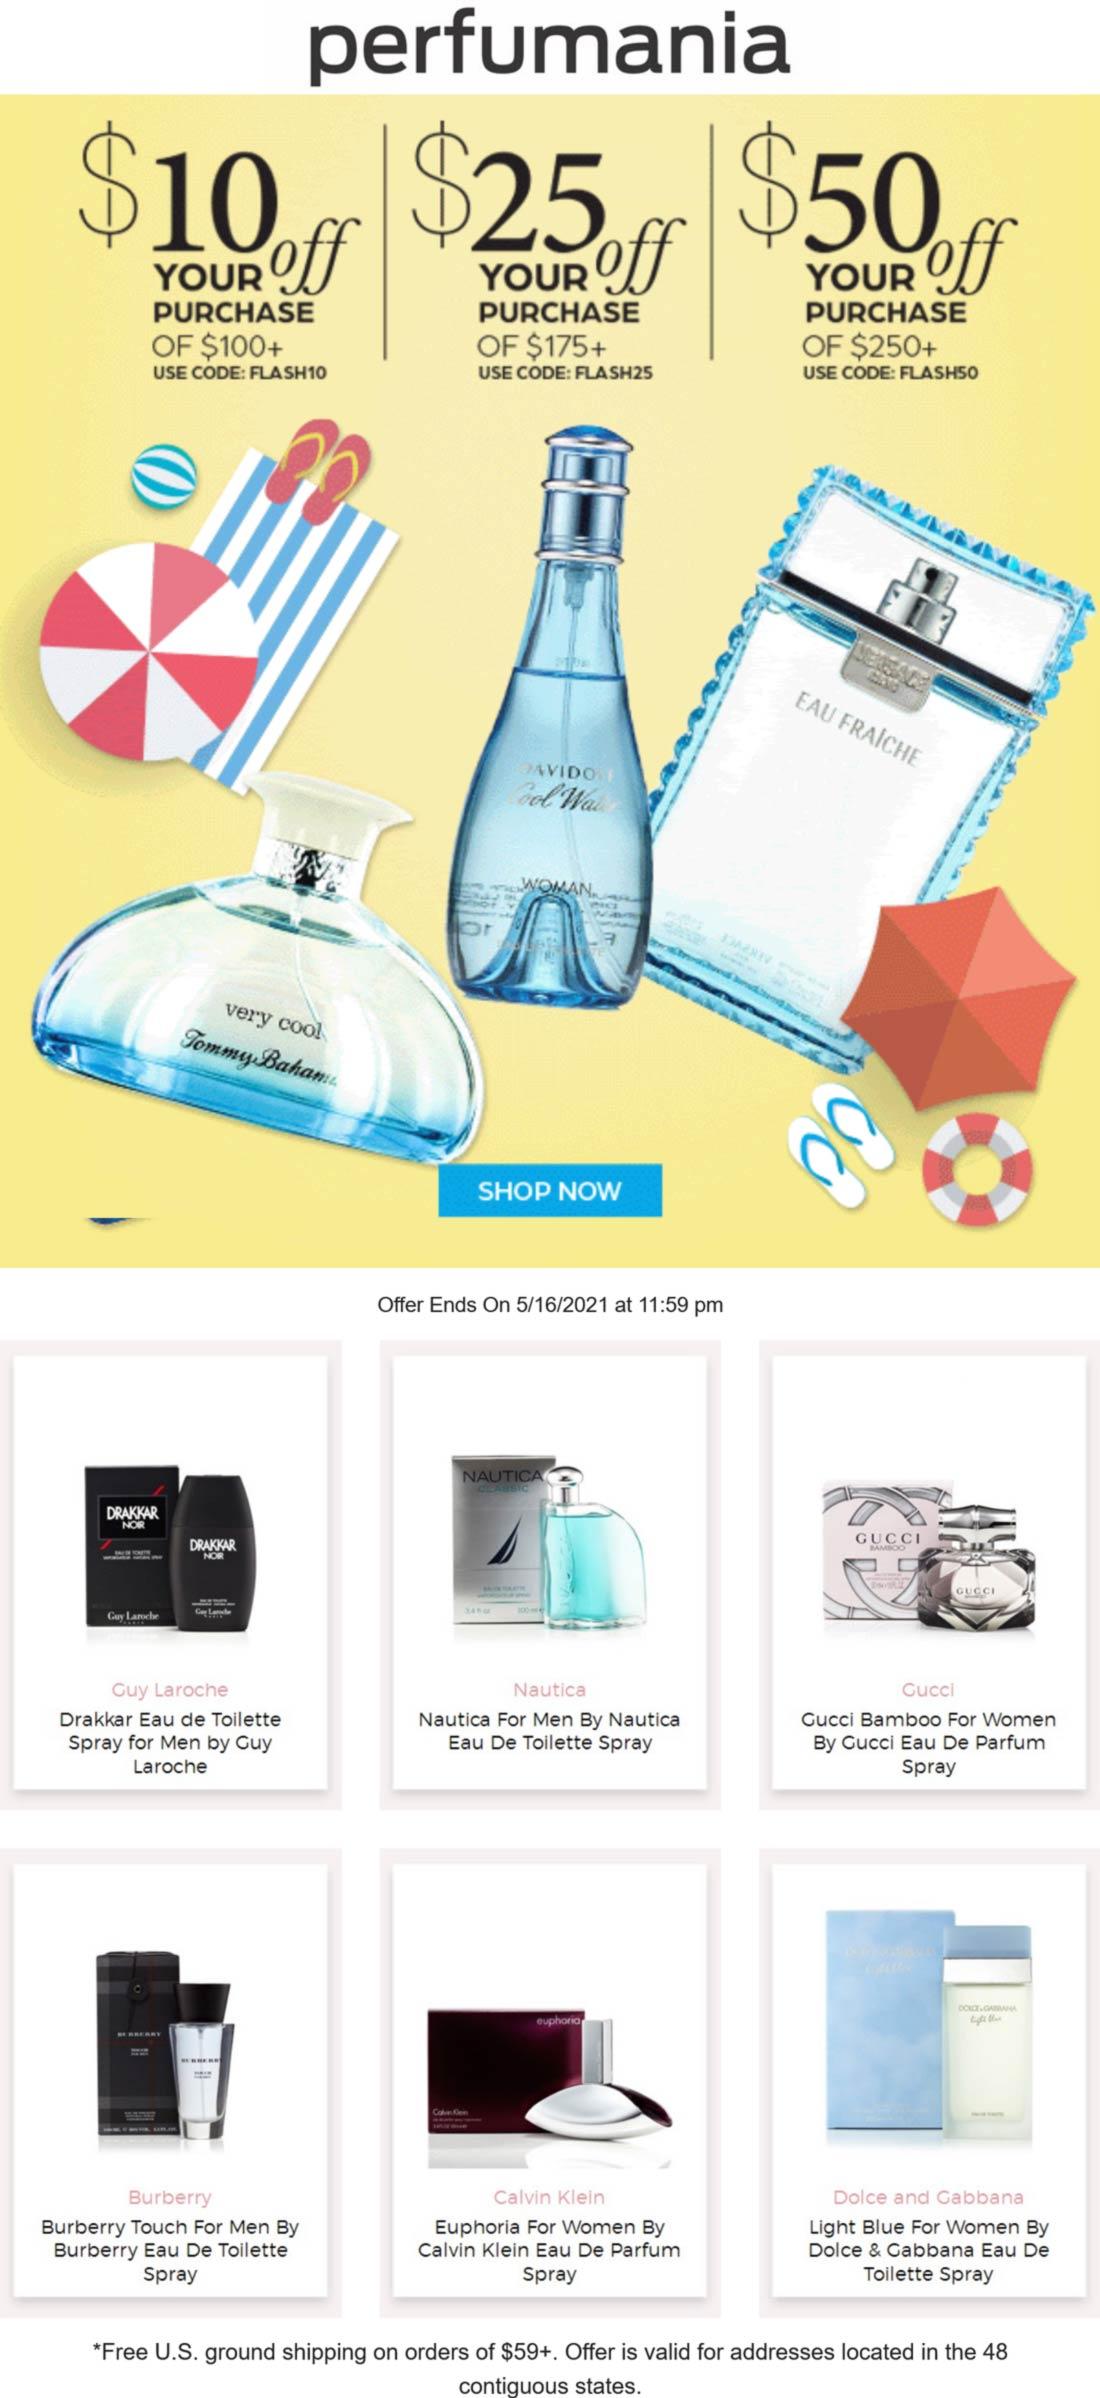 Perfumania stores Coupon  Fragrances are $10-$50 off $100+ today online at Perfumania via promo code FLASH10 #perfumania